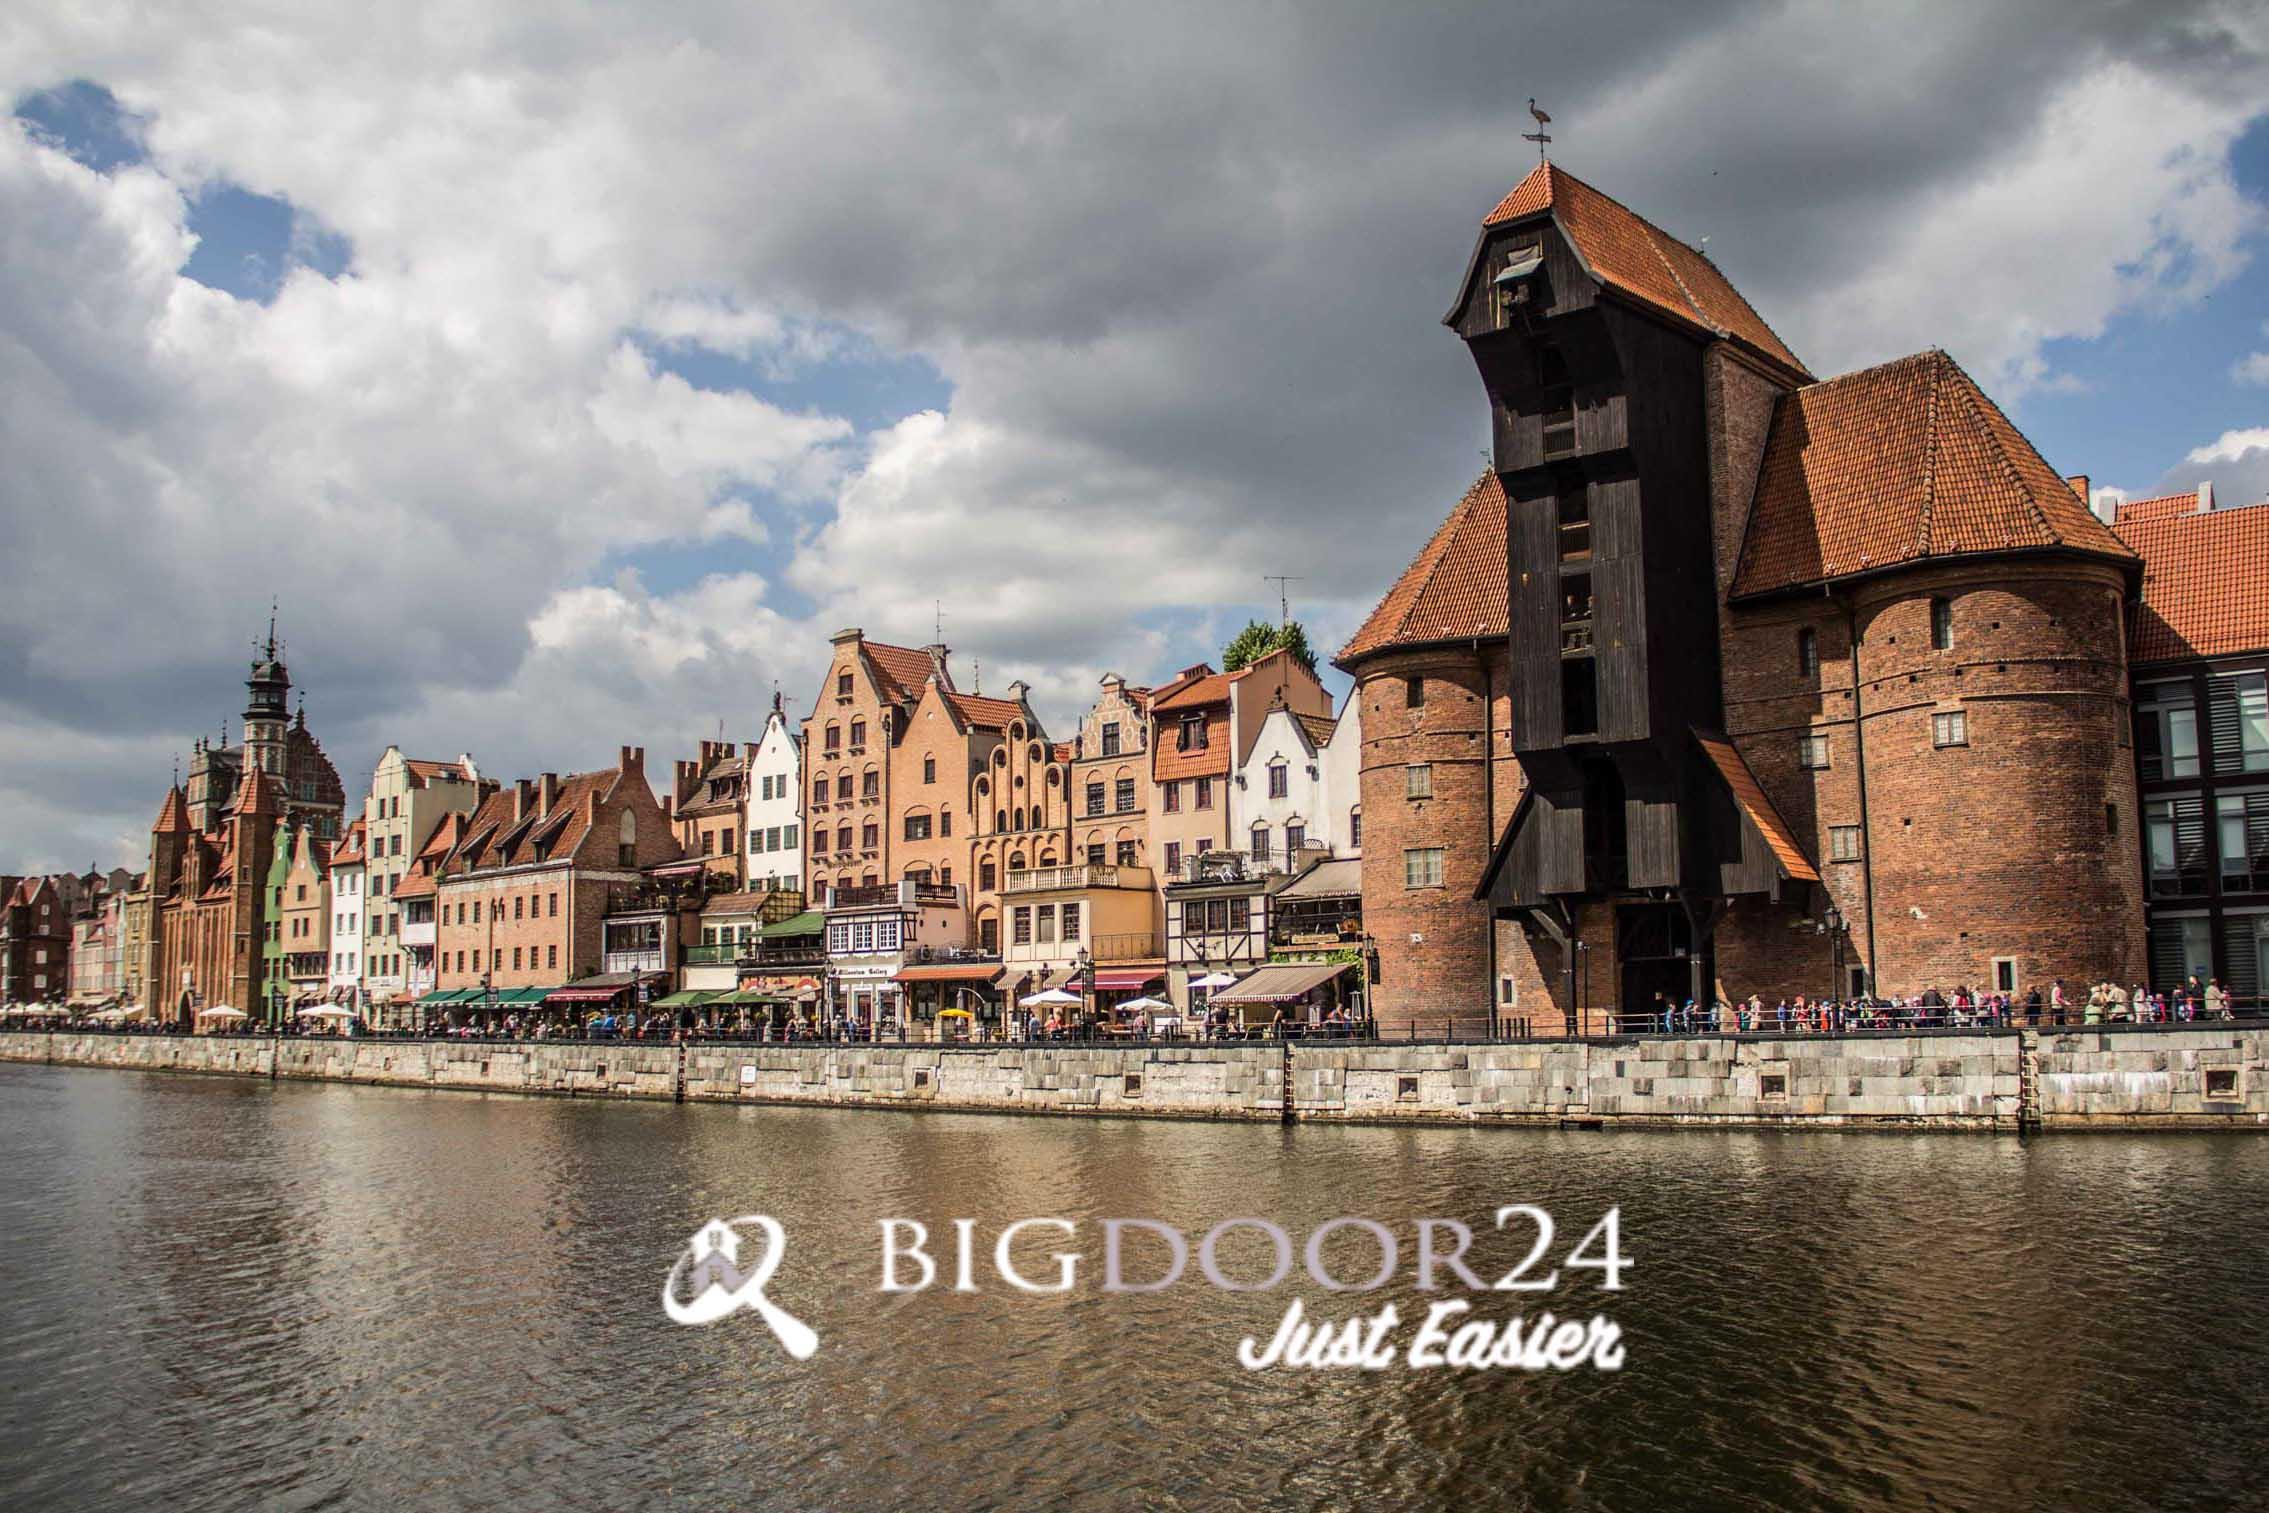 BigDoor24 enters Tricity, photo: Jakub Woźniak/Tricity News